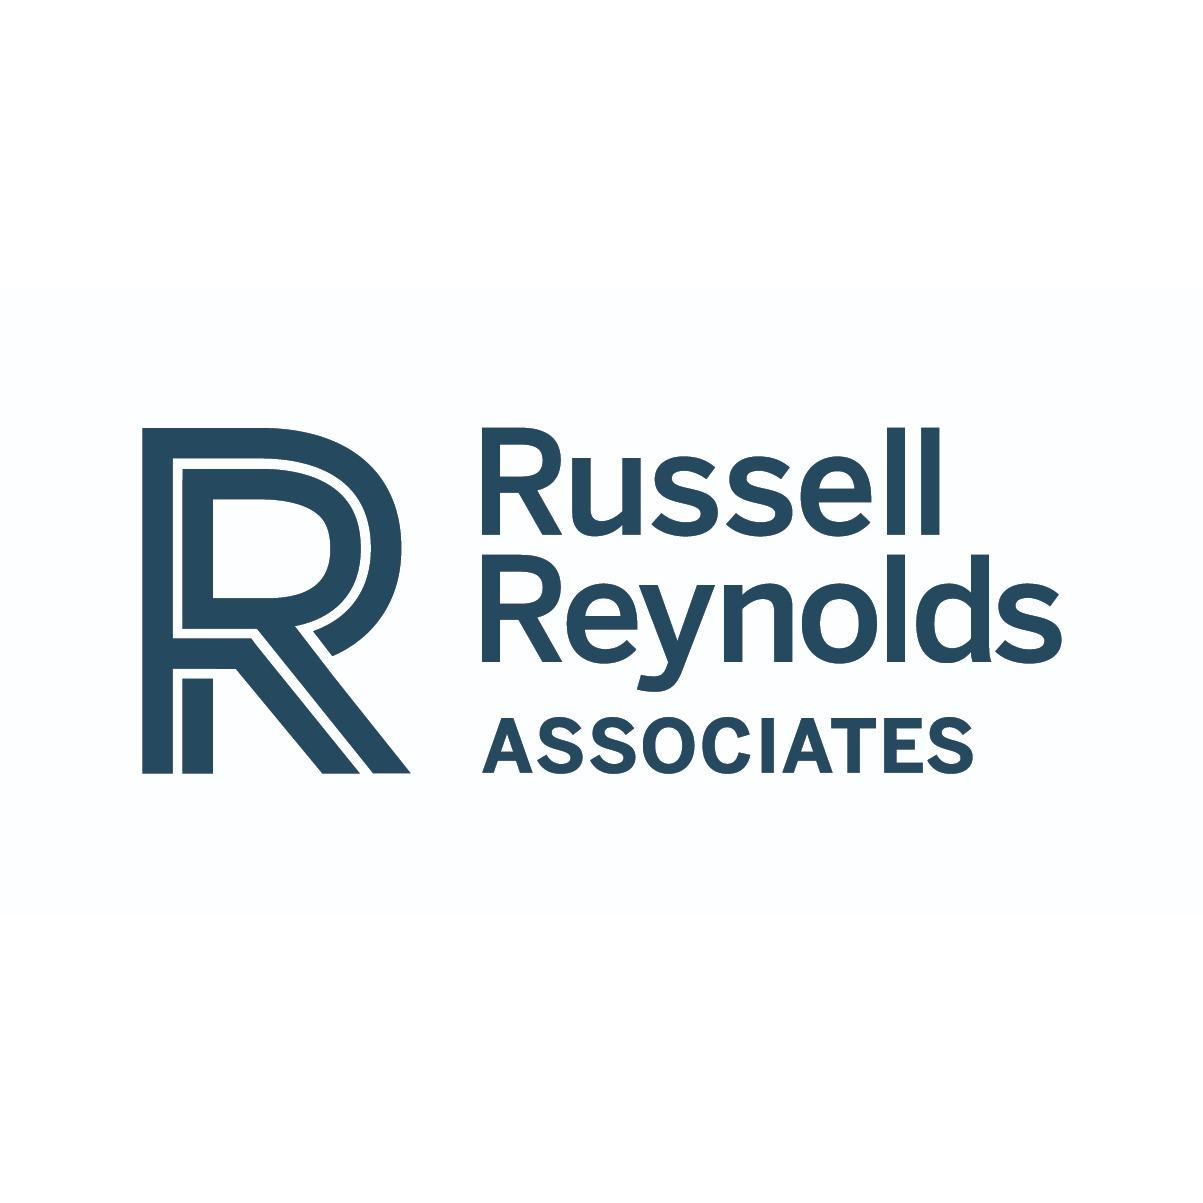 the Russell Reynolds Associates logo.